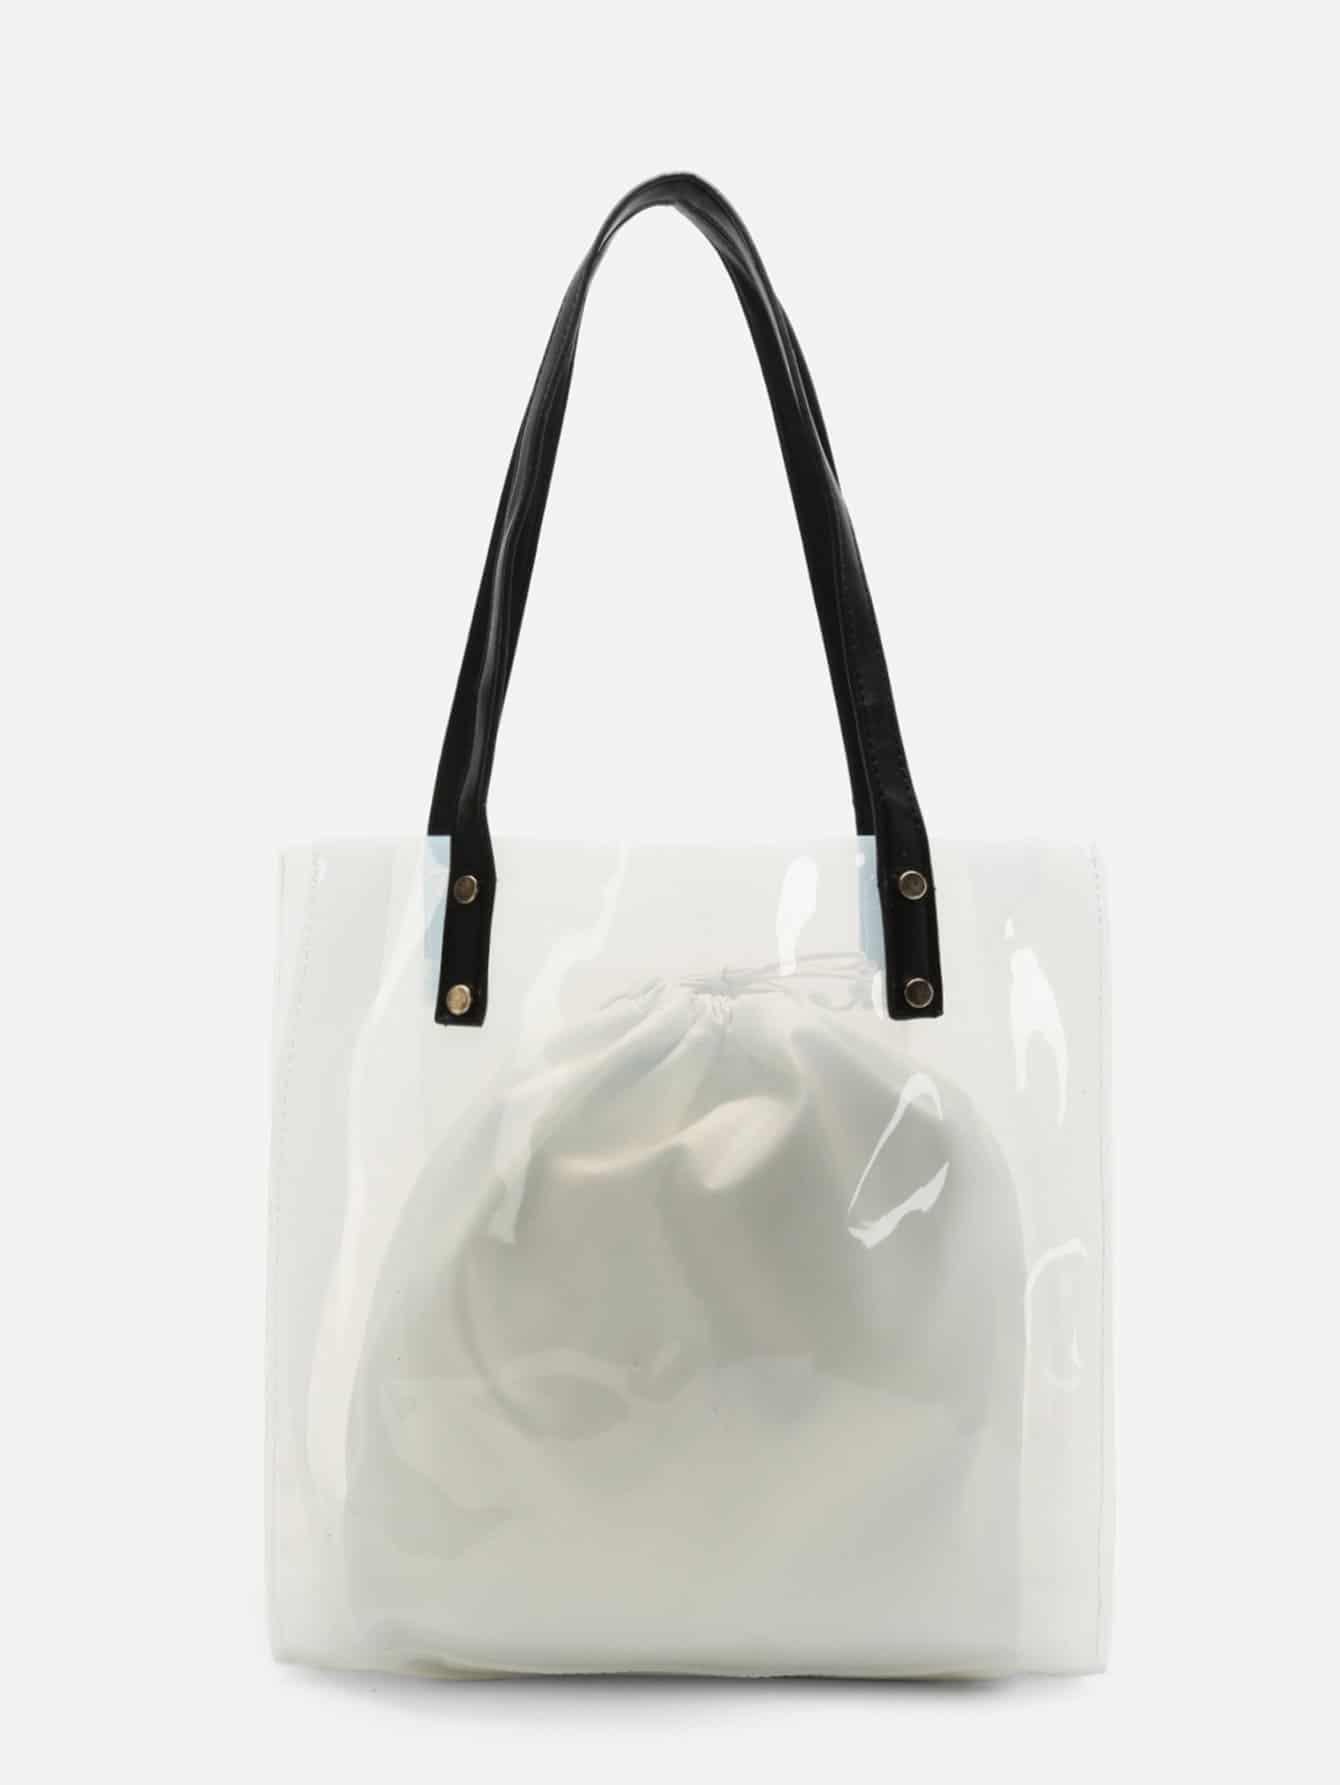 Прозрачная сумка с внутренним чехлом